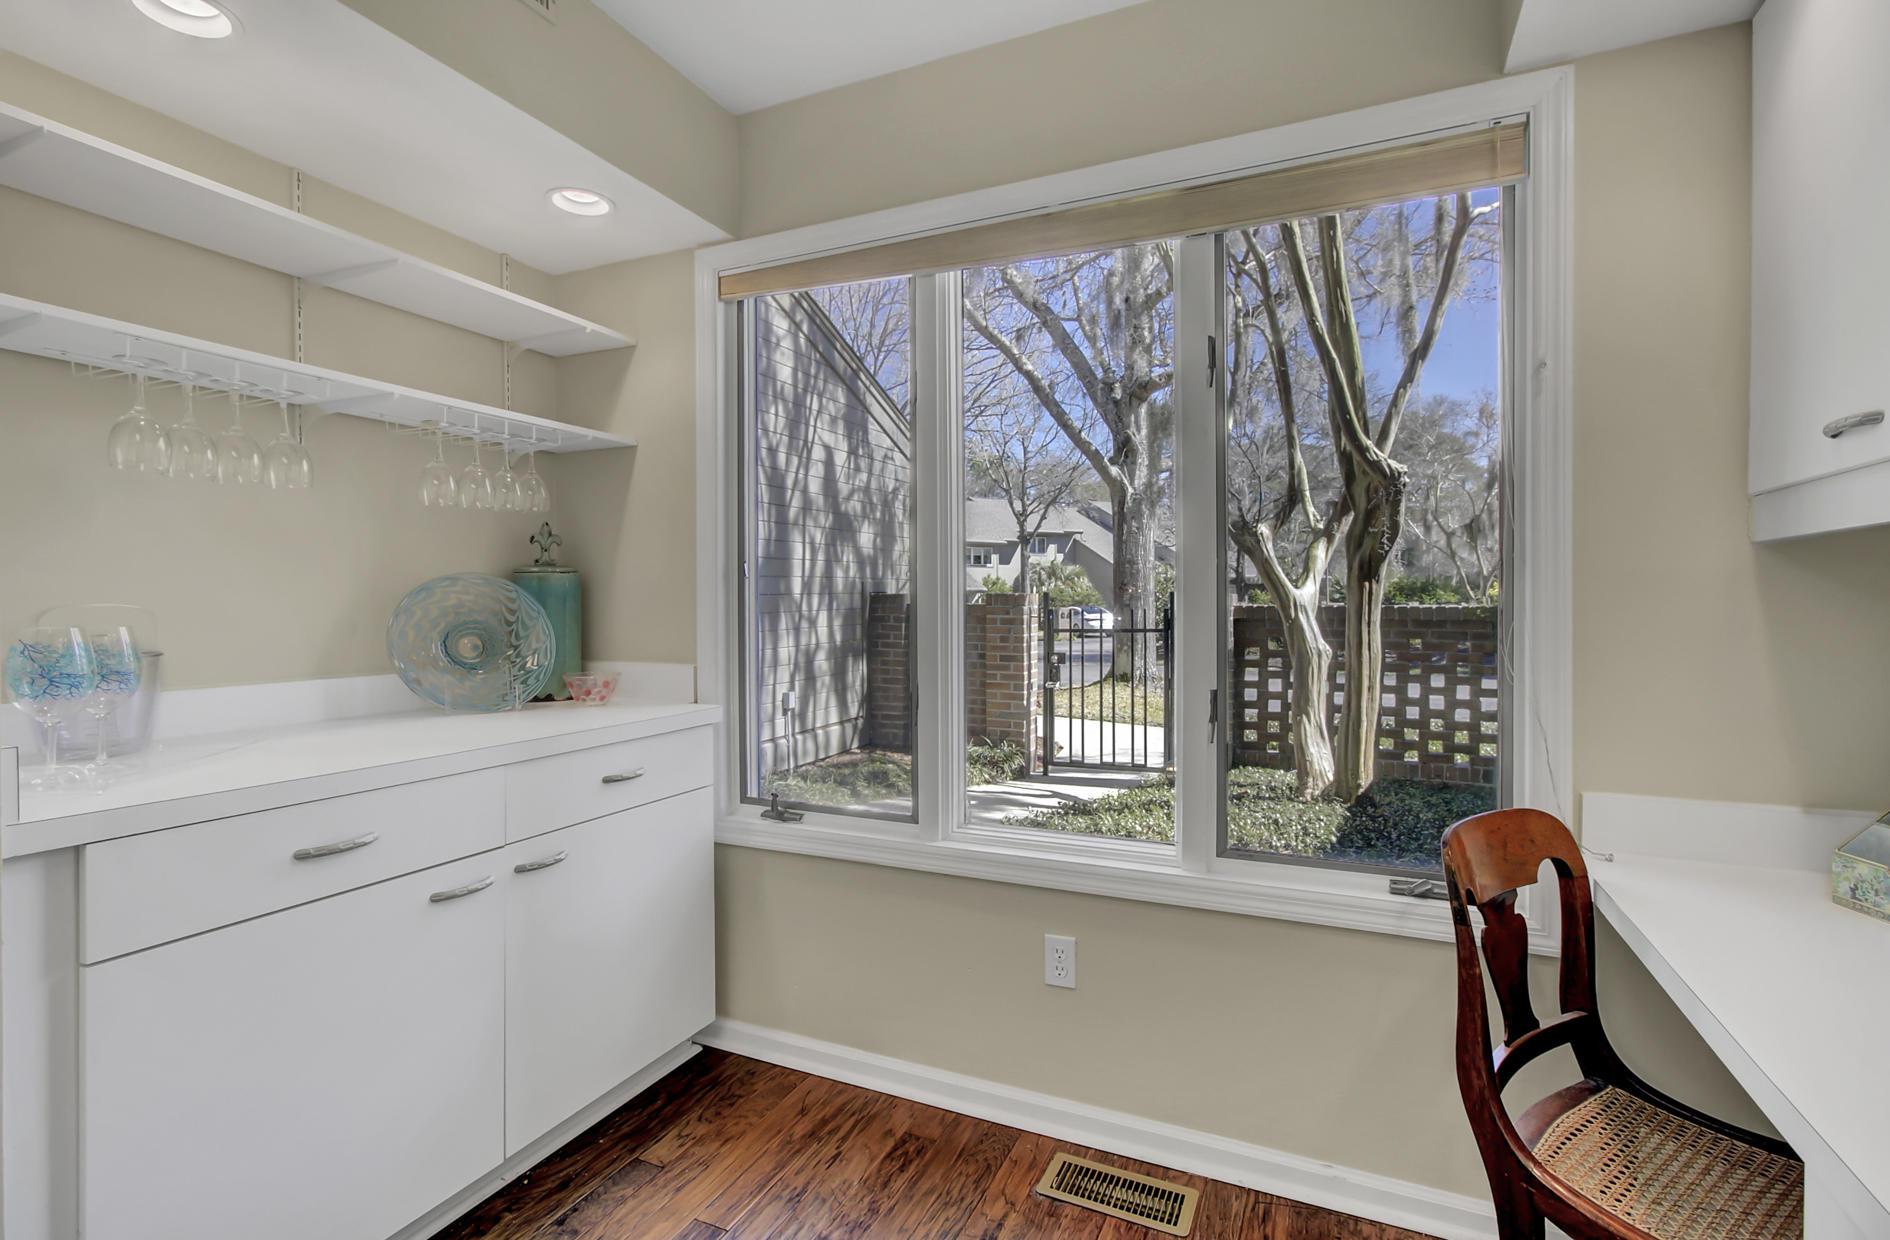 Wappoo Creek Place Homes For Sale - 29 Wappoo Creek, Charleston, SC - 21